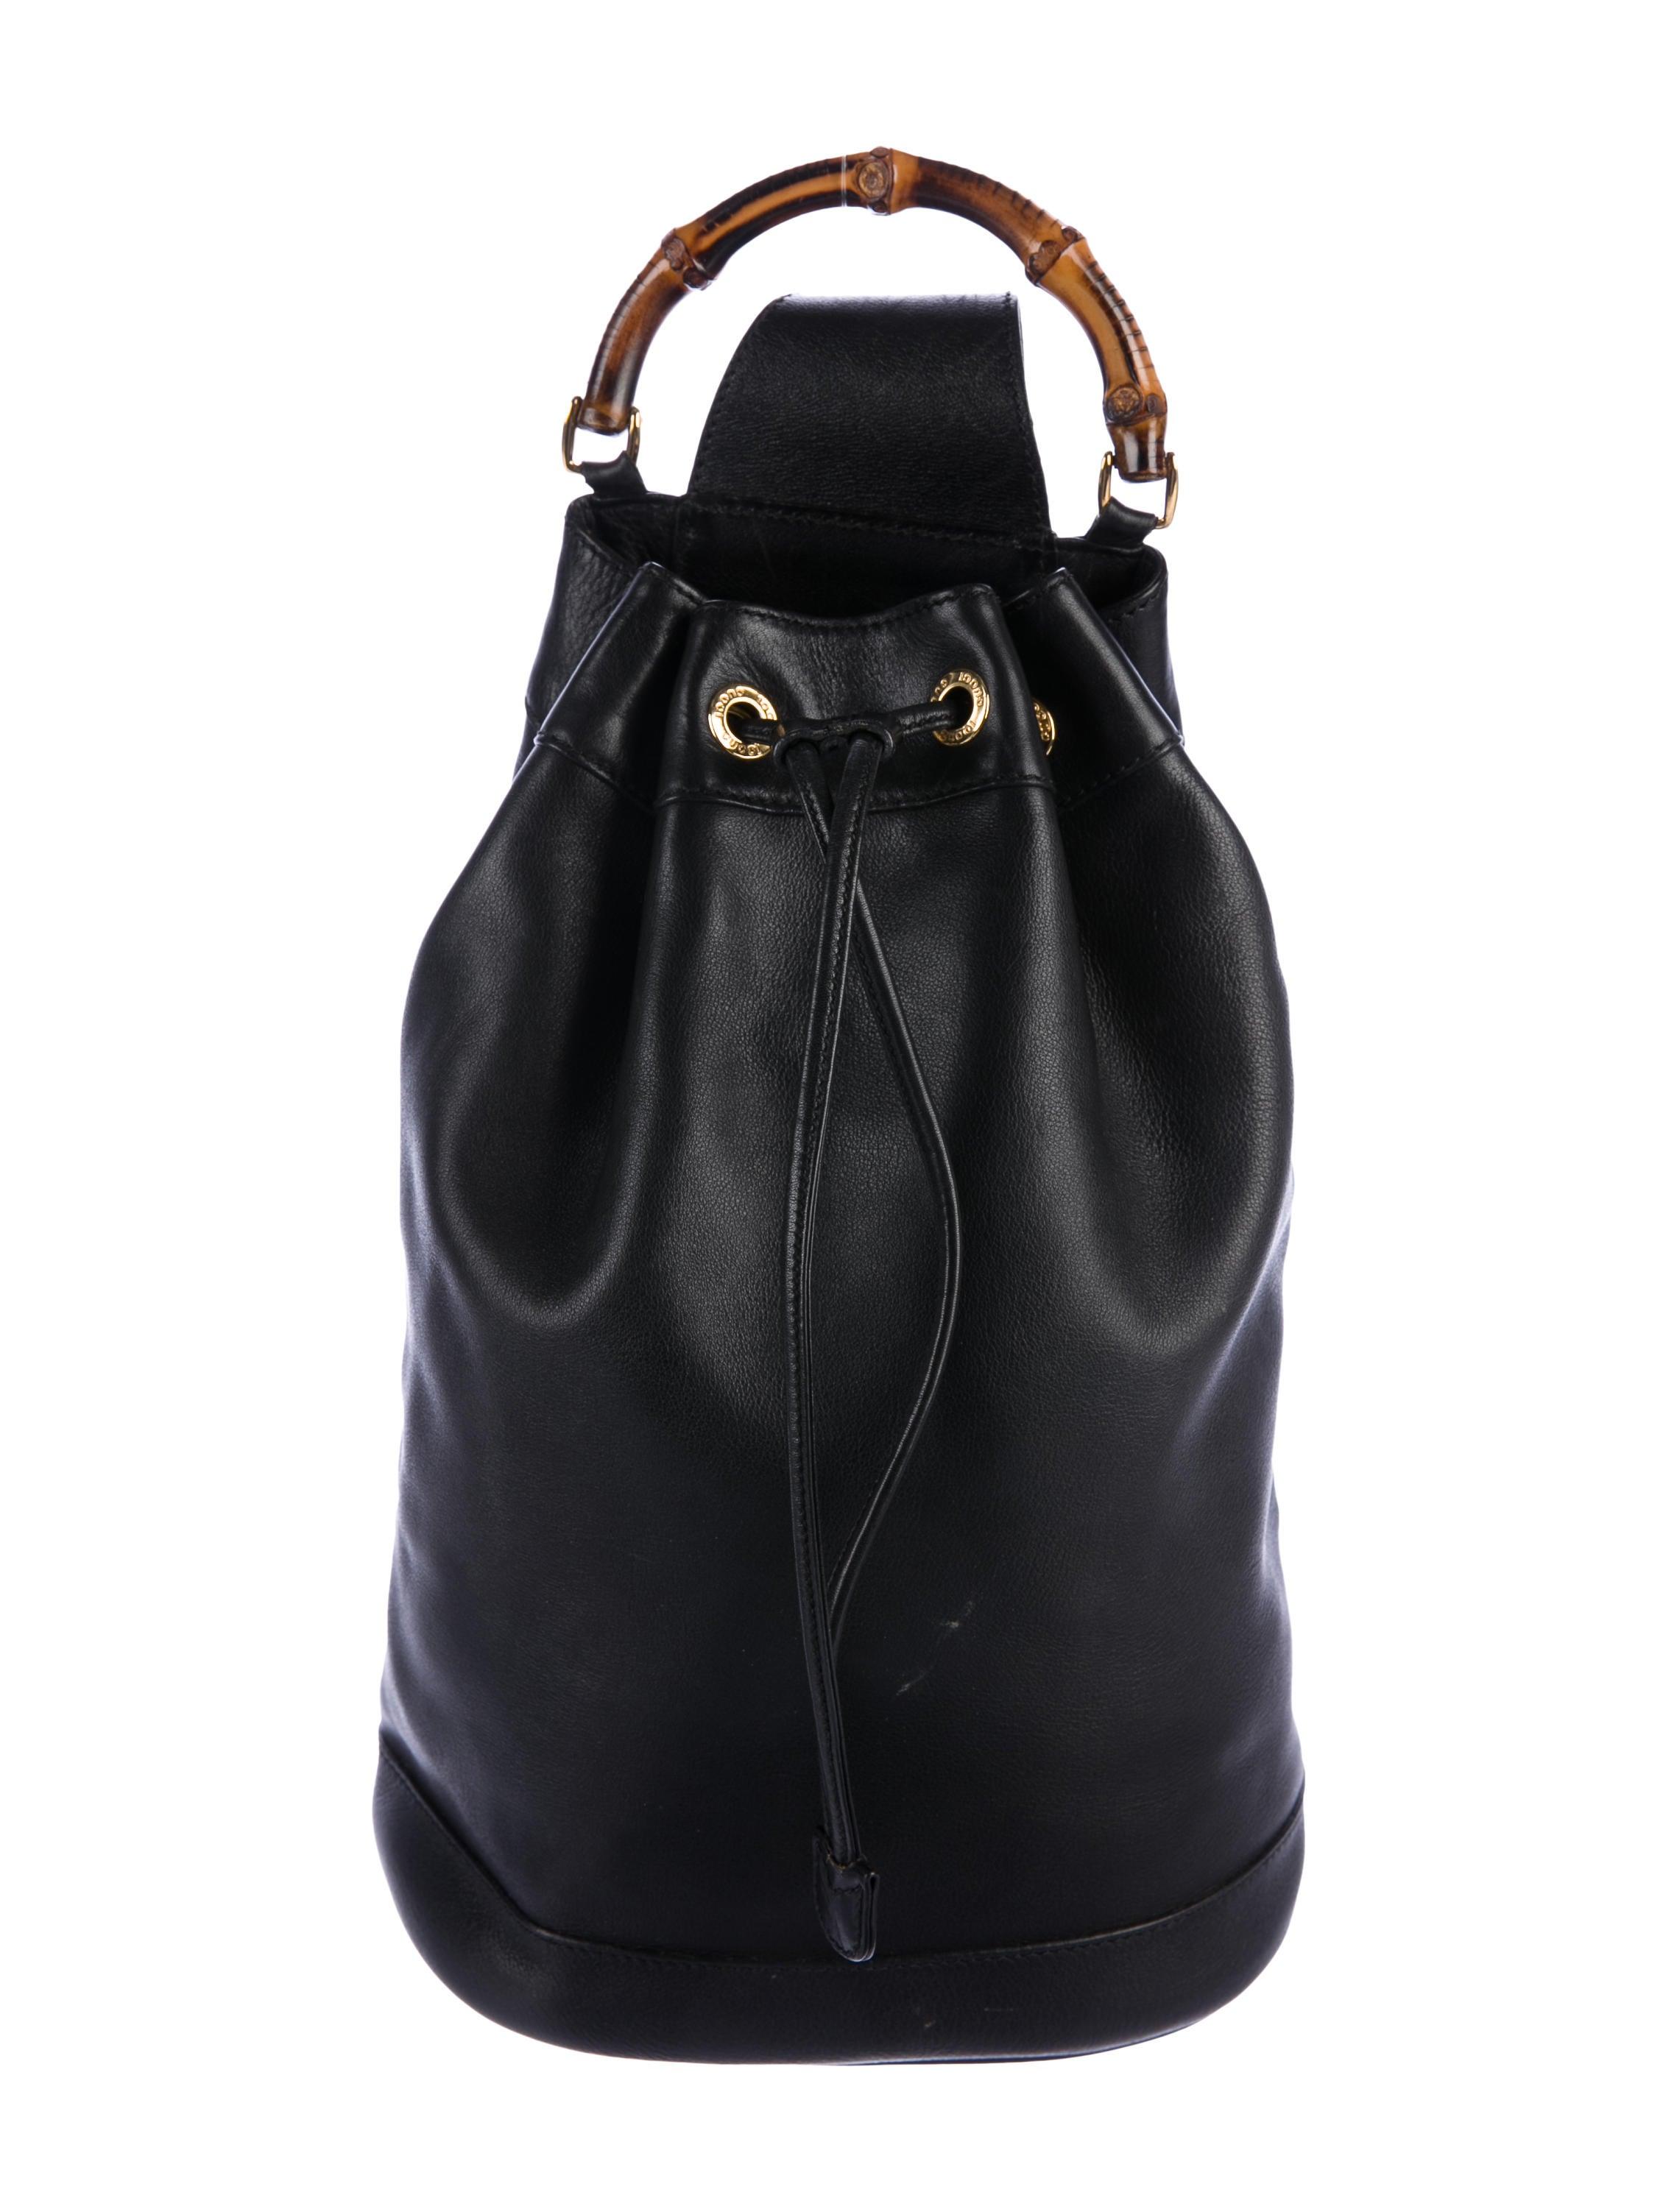 Innovative NEW Authentic GUCCI Crystal GG MESSENGER BAG LAPTOP SLING BAG Brown 278301 9643 | EBay